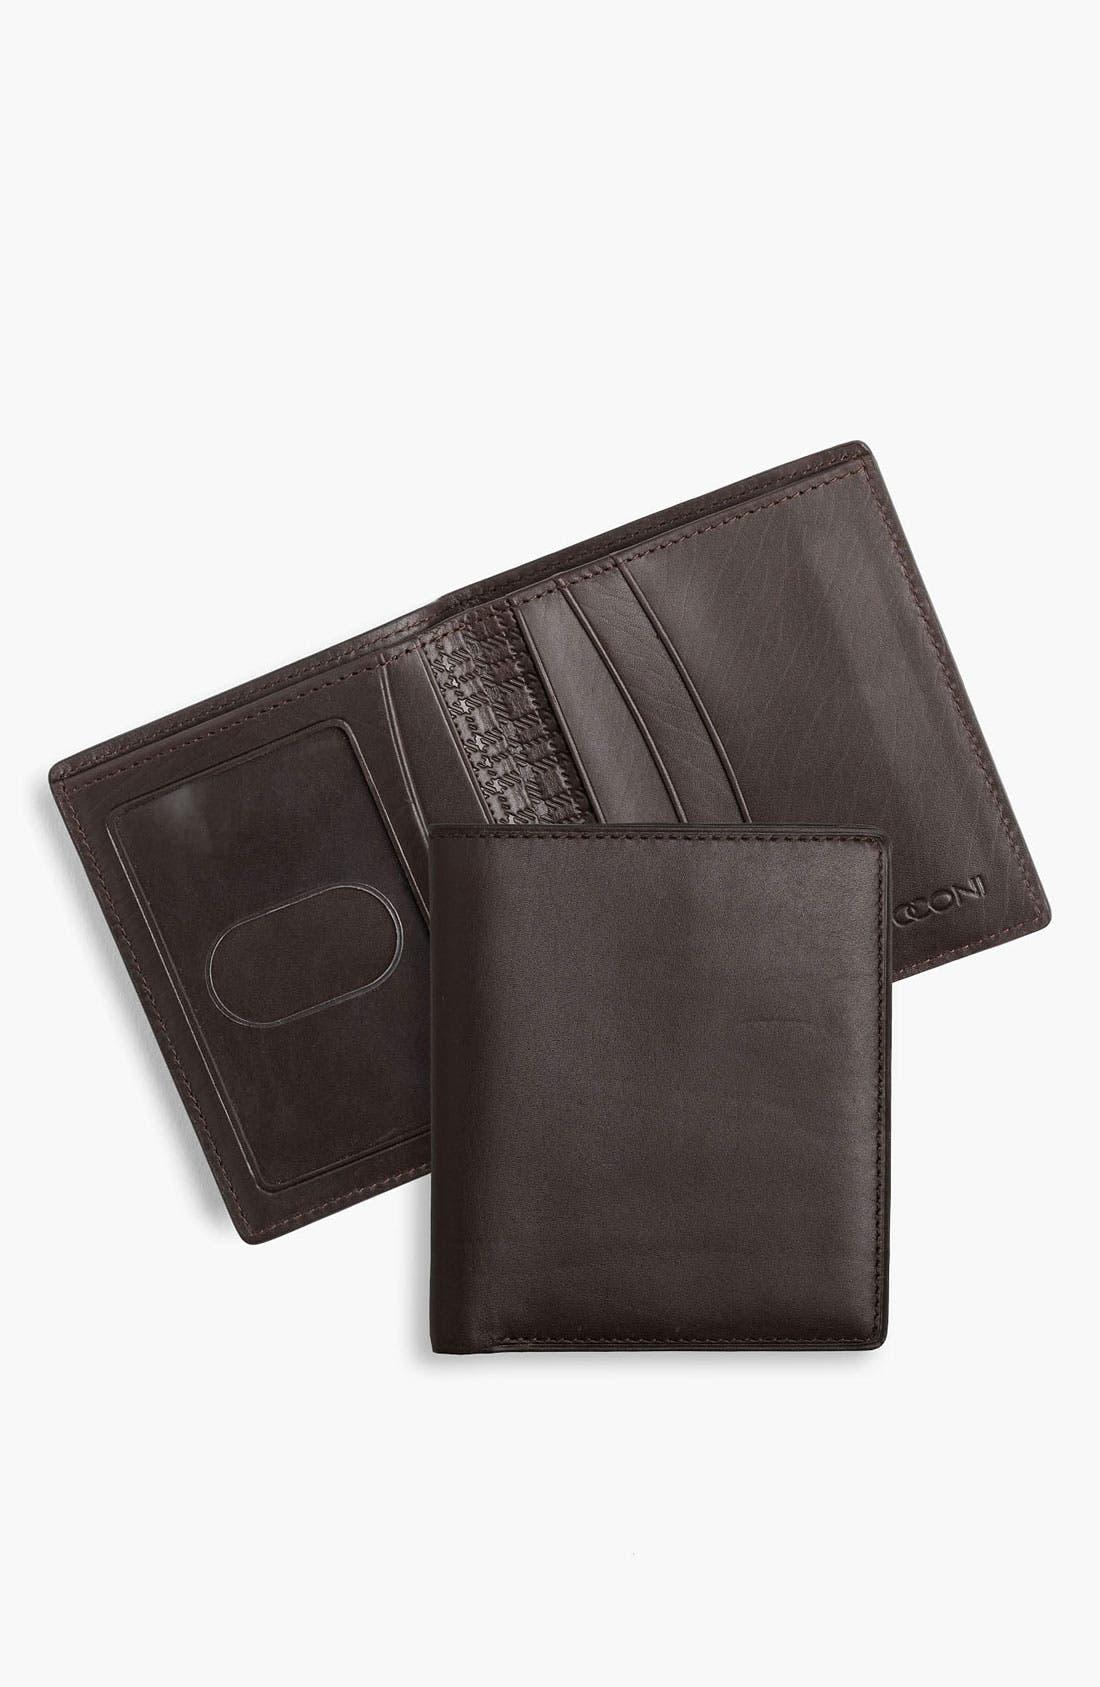 Main Image - Boconi 'Xavier' Compact Wallet